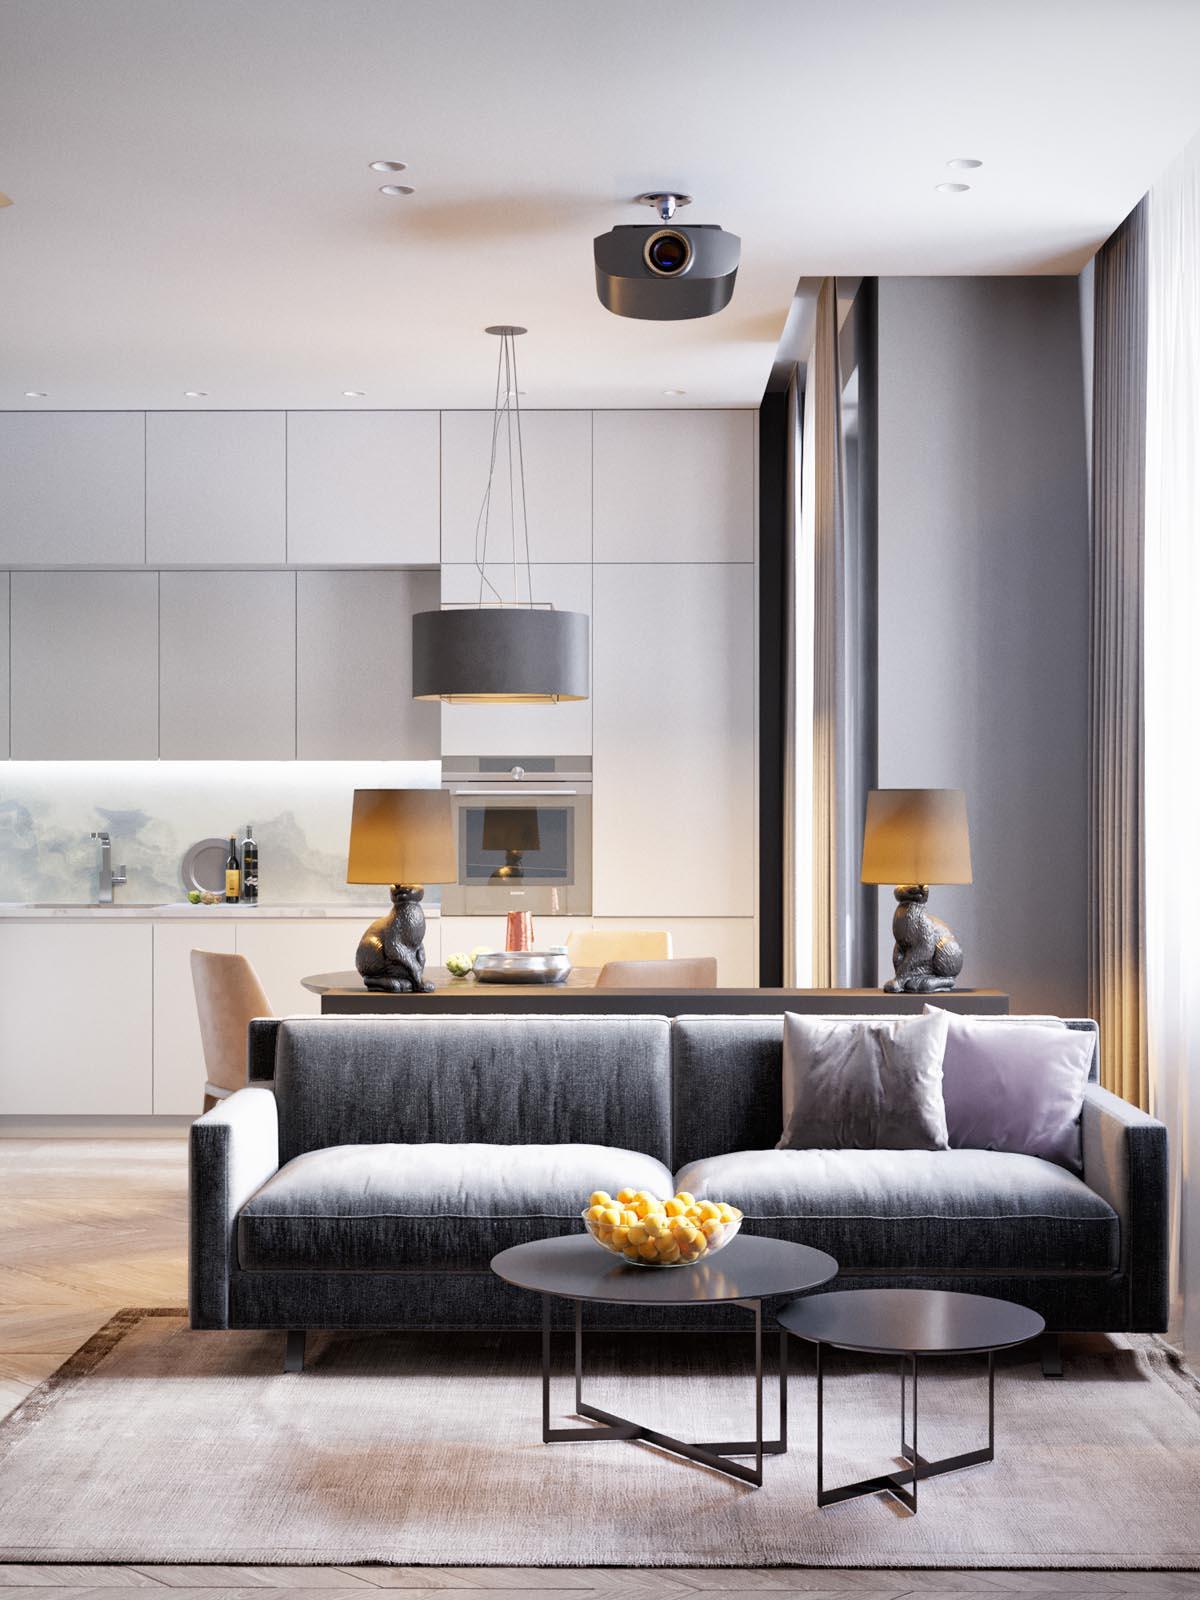 1 visualizer maxim tsiabus at just 50 square meters this attractive apartment